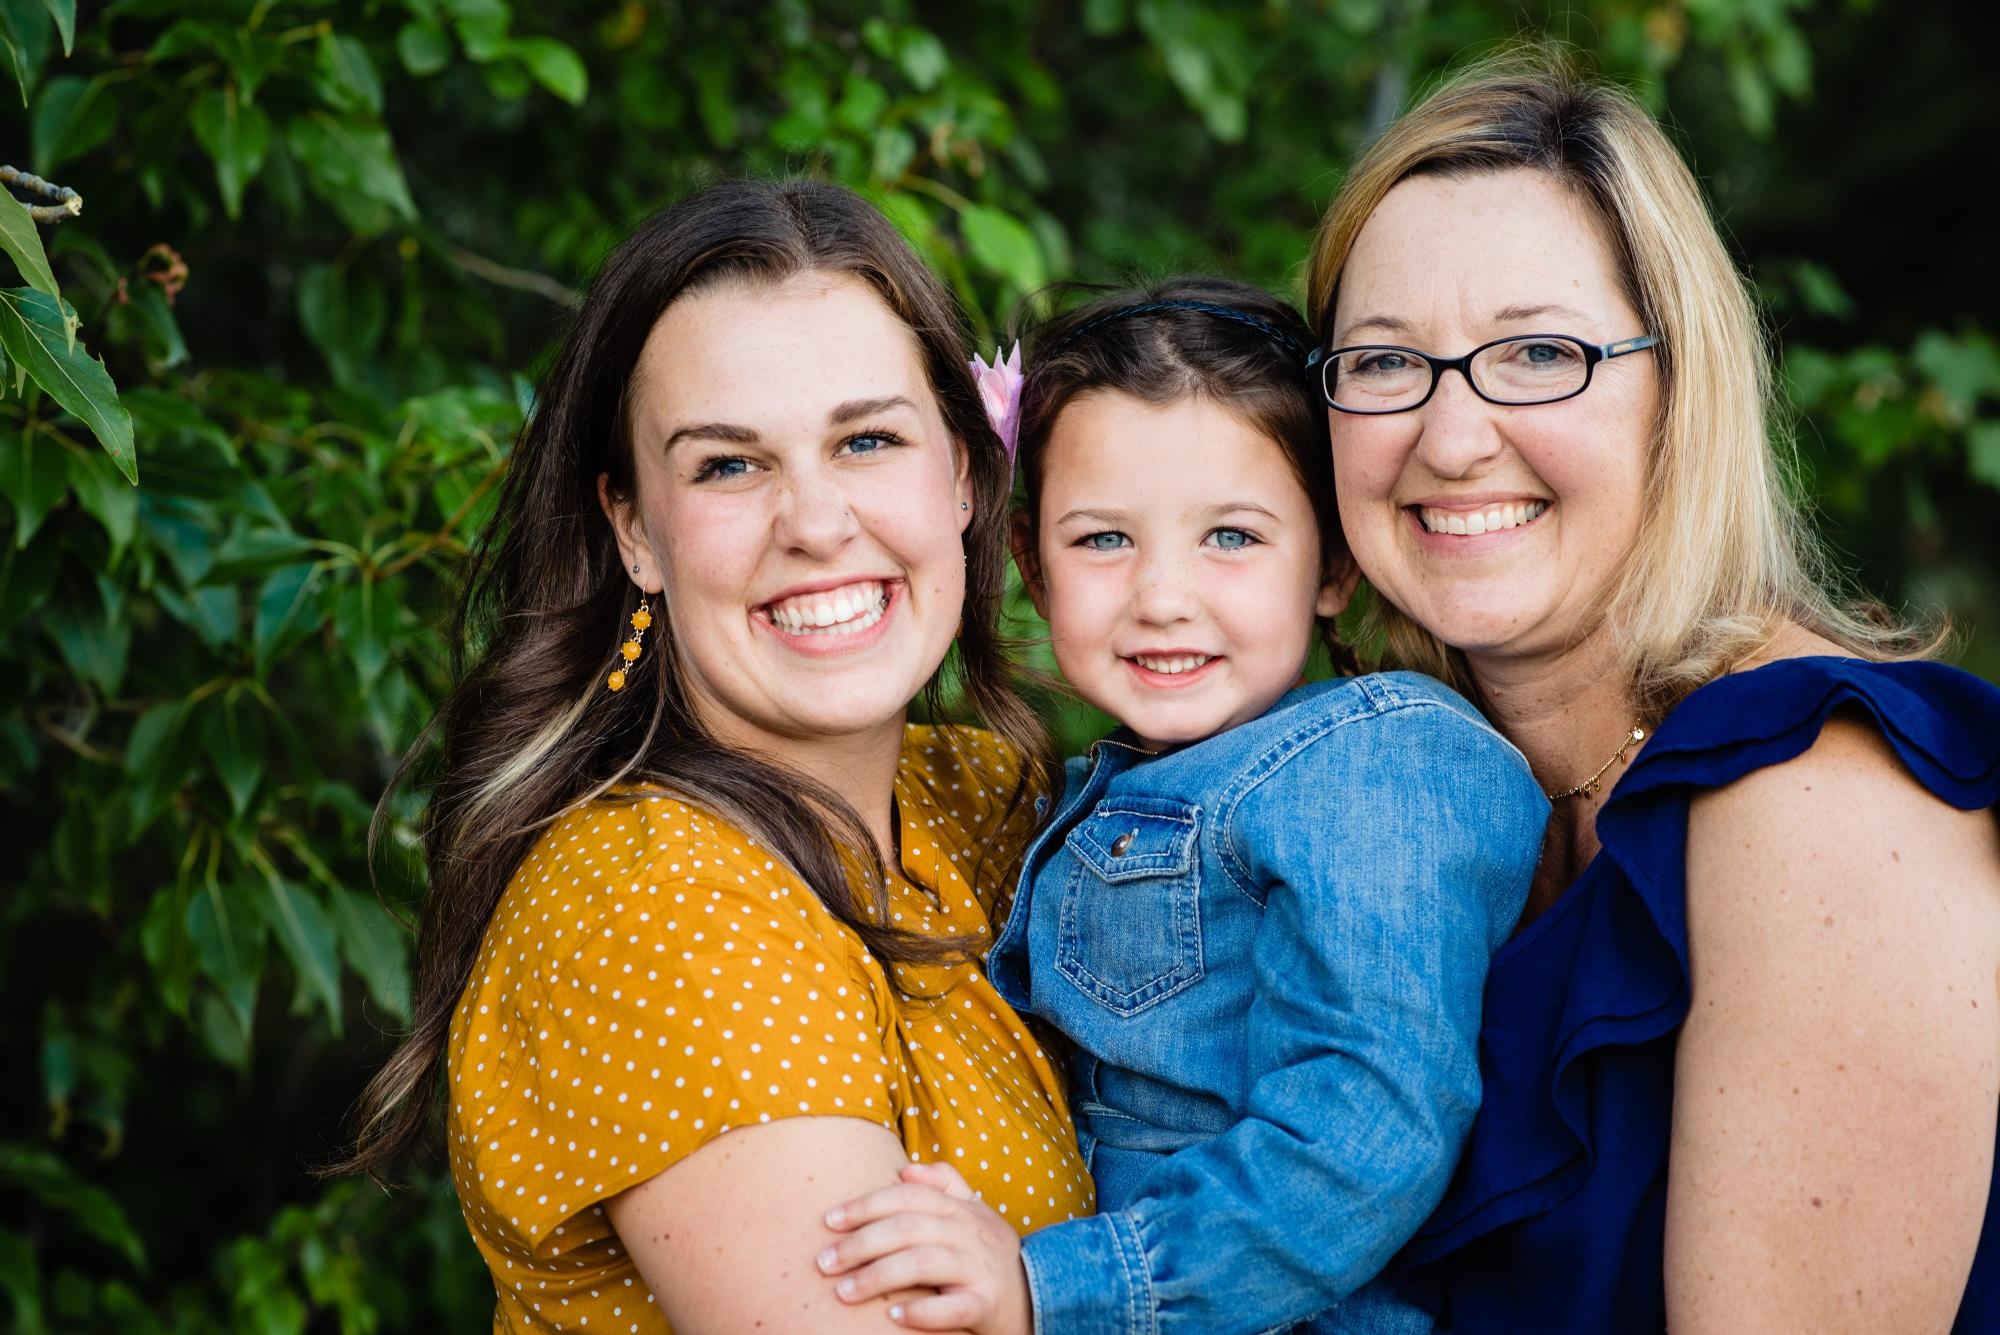 lindseyjanephotography_family0020.jpg